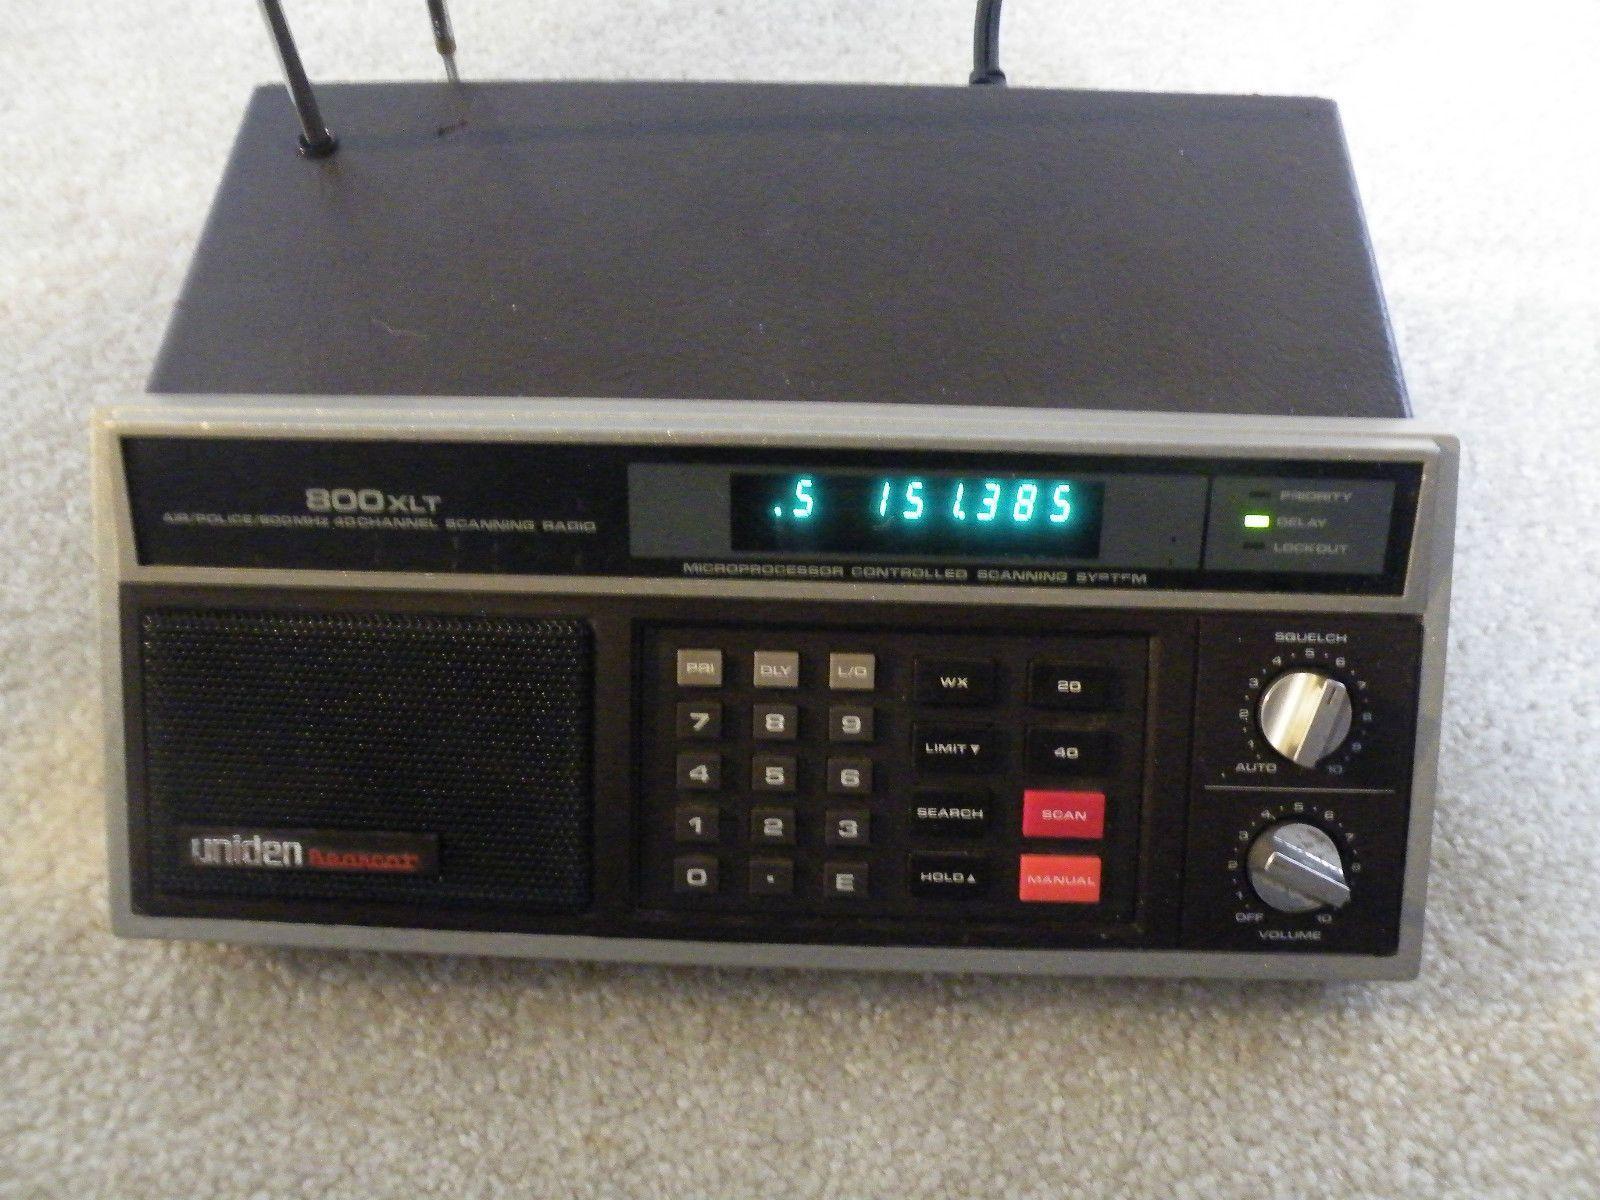 The Uniden-Bearcat 800XLT Scanner.